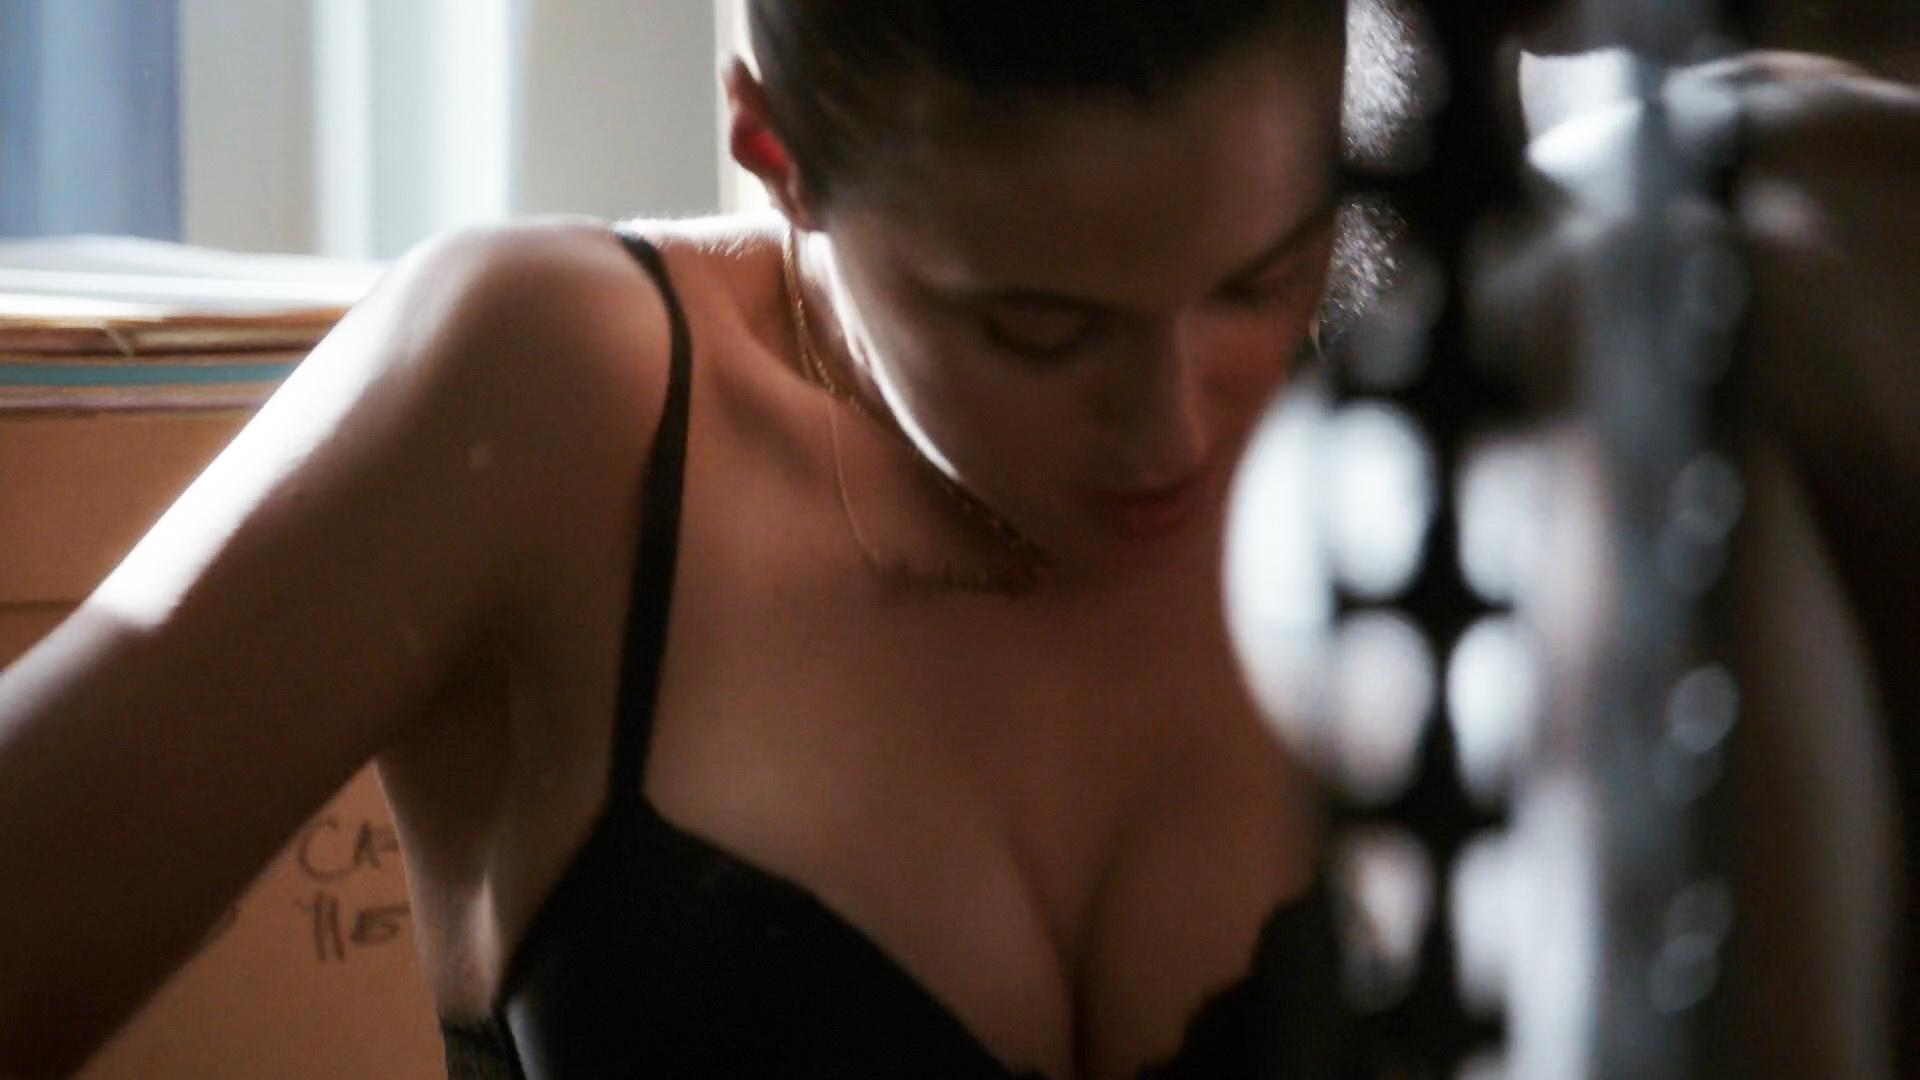 Pornstar casey cumz free pictures and videos XXX